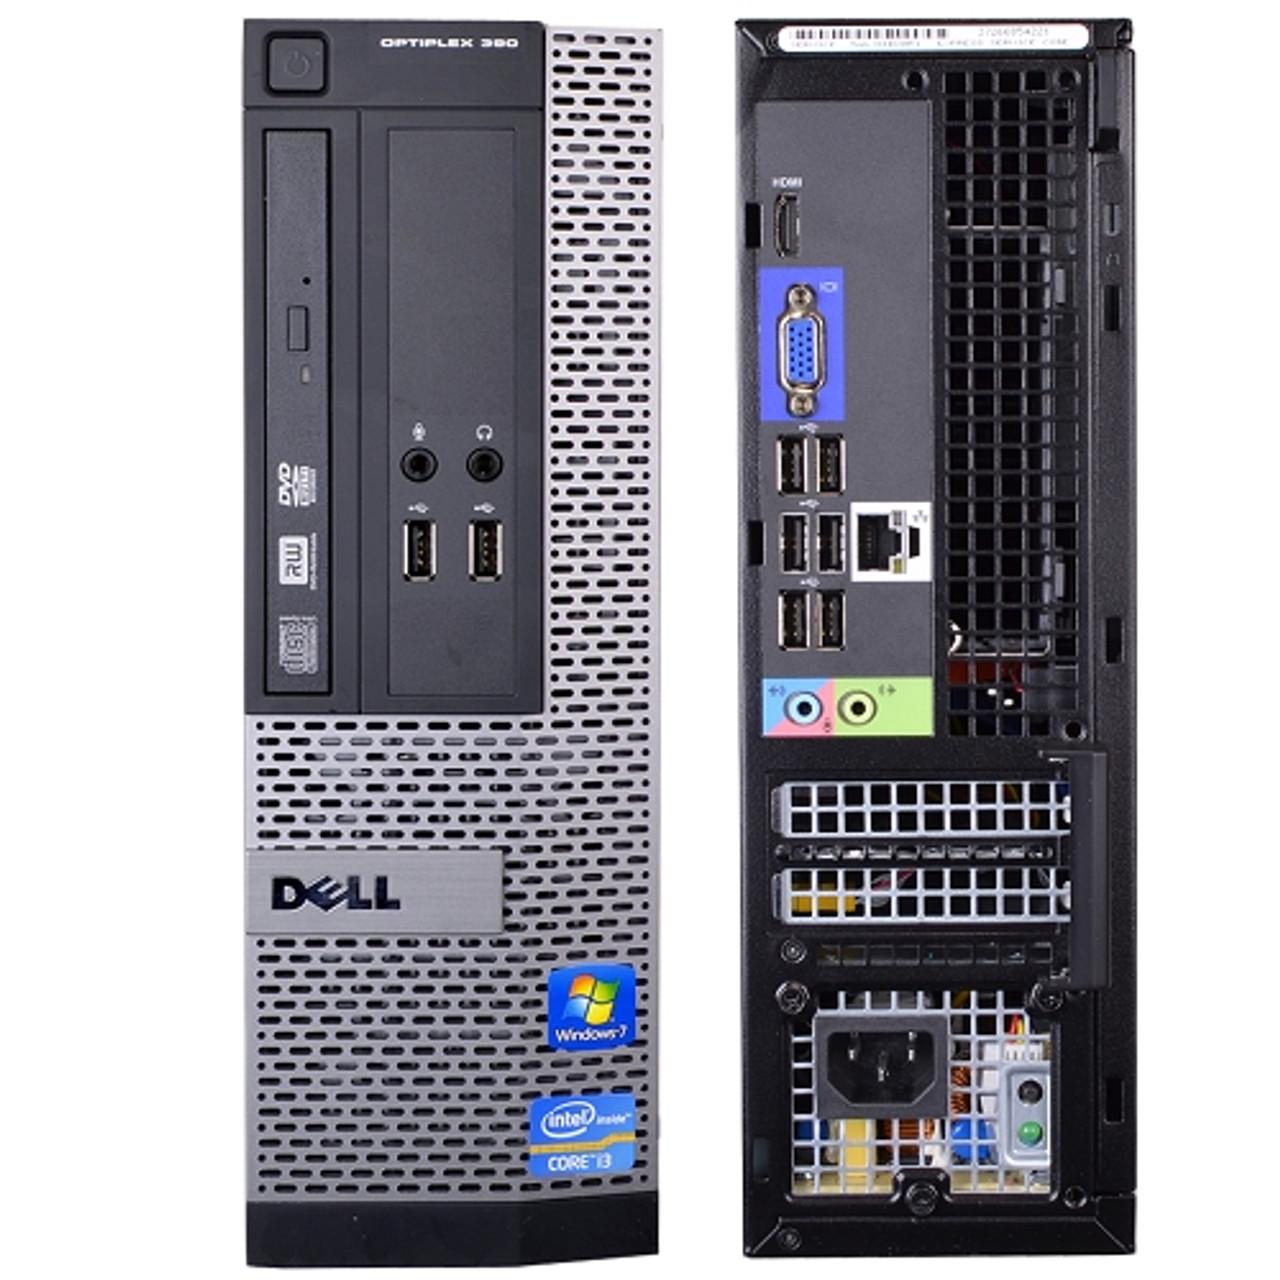 Dell Optiplex 390 SFF Core i3 3.3GHz, 4GB Ram, 250GB HDD, DVD-RW, Windows 10 Pro 64 Desktop Computer